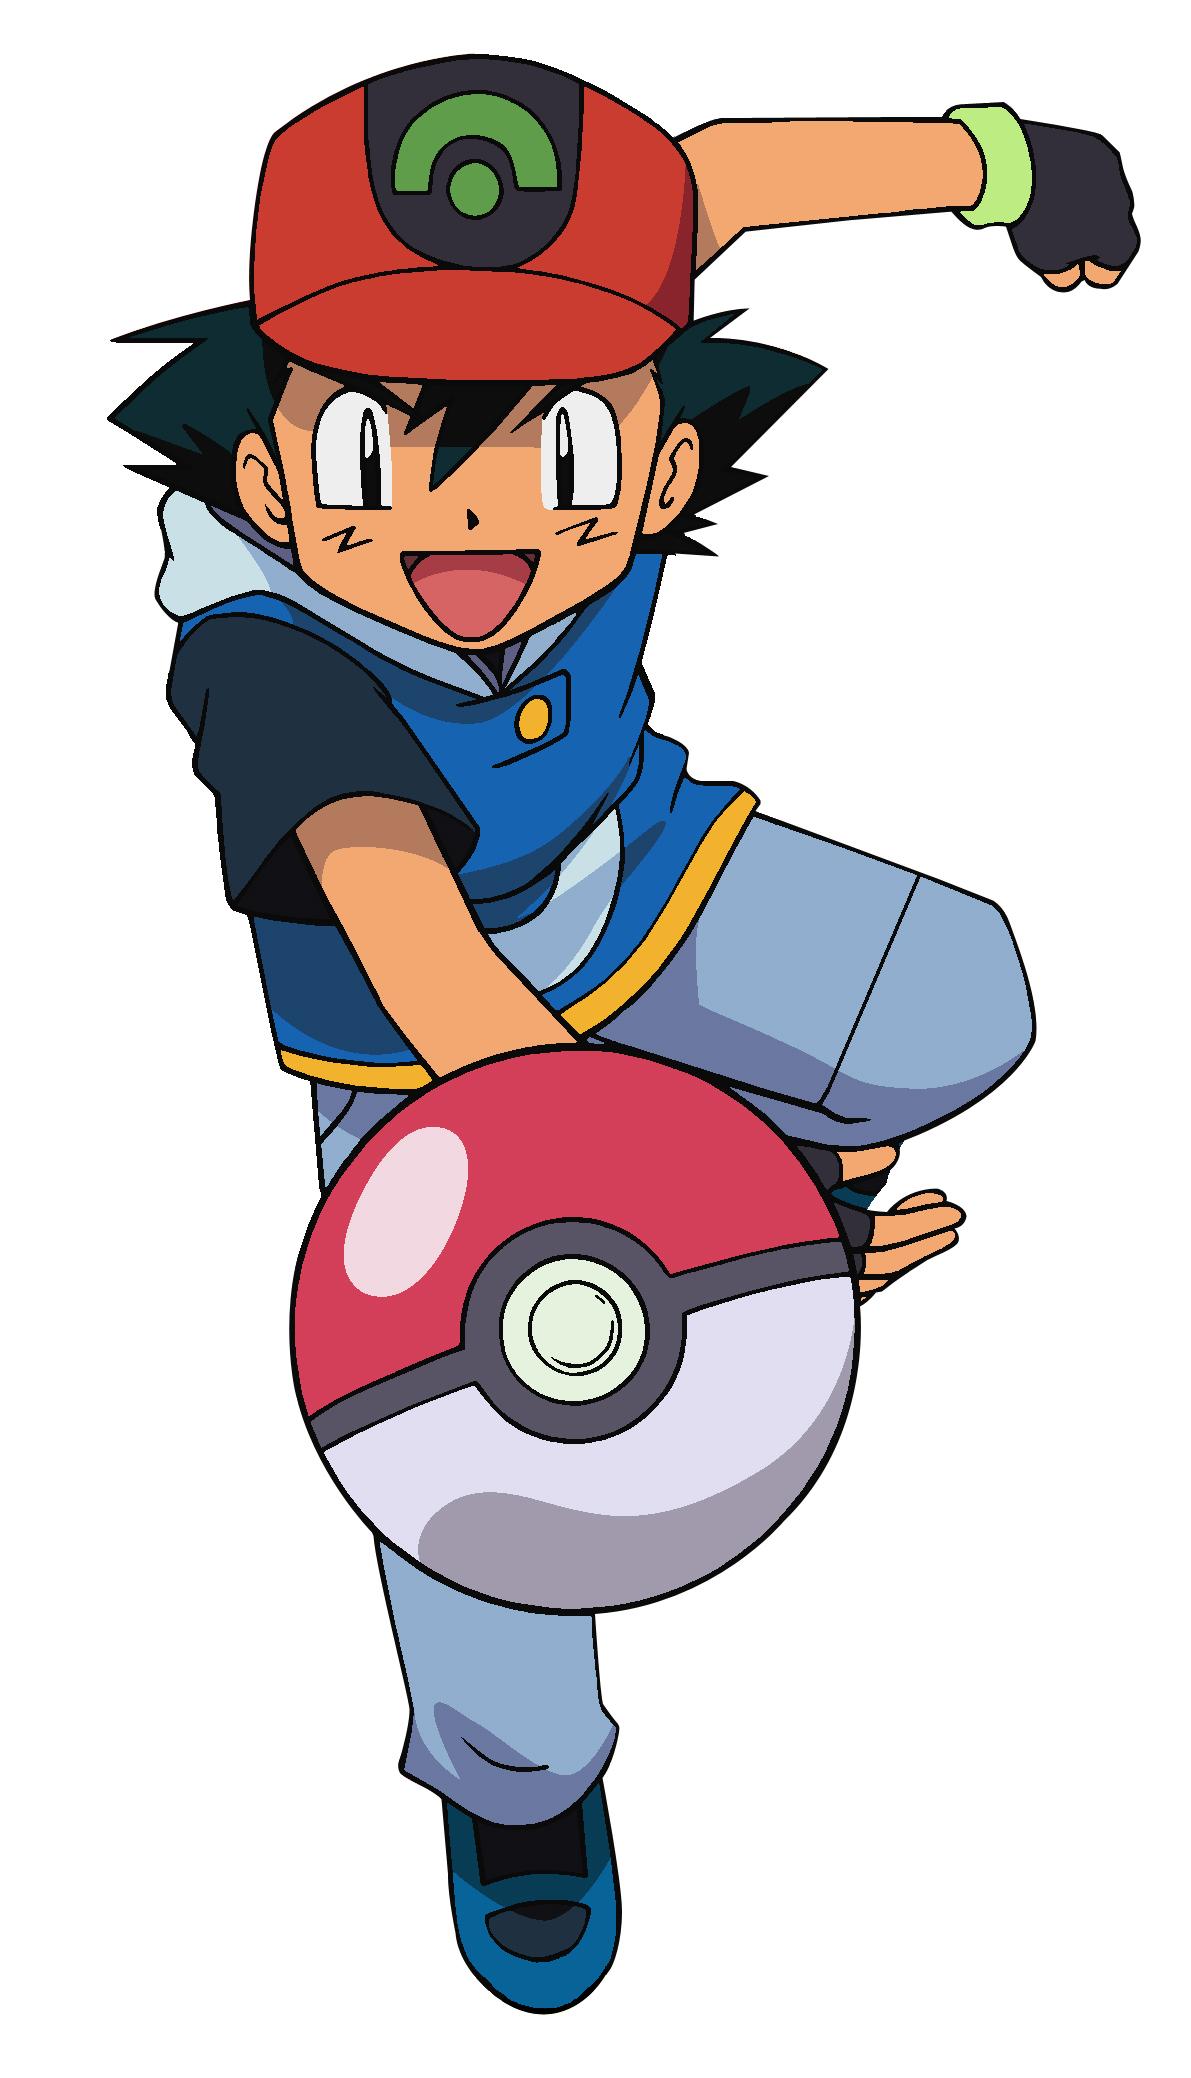 ketchum Pokemon ash